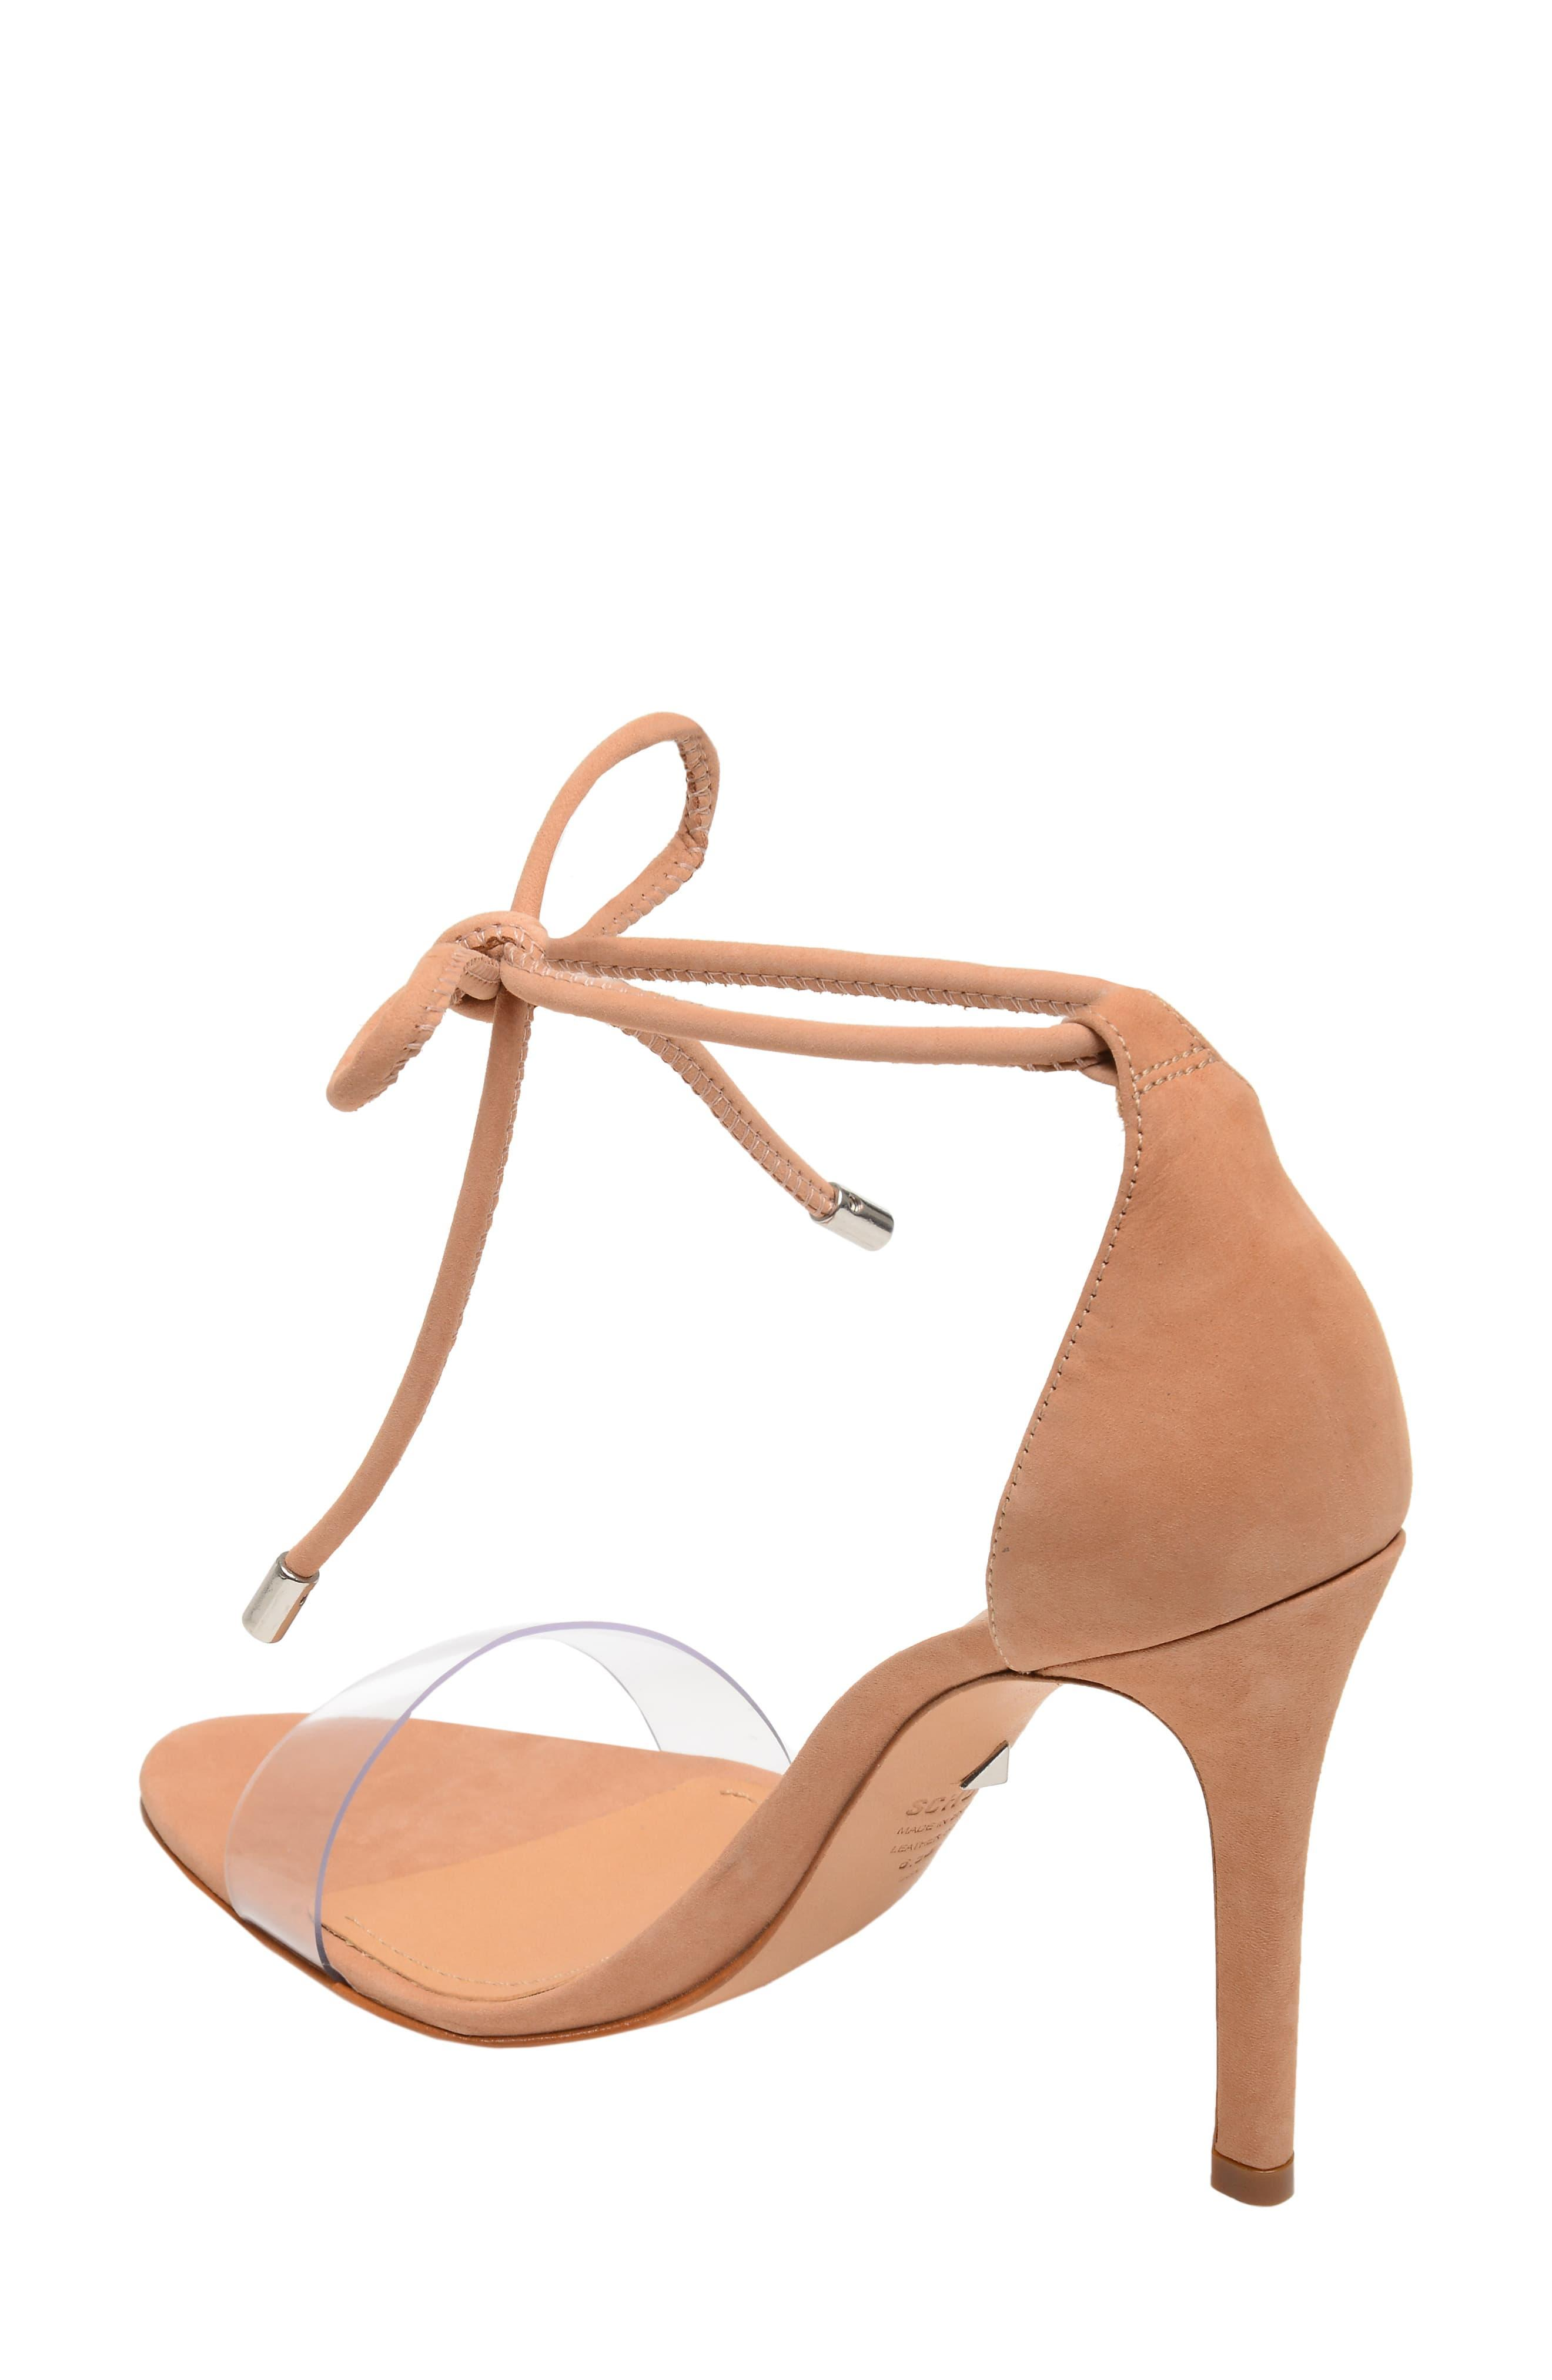 Schutz Shutz Monique Ankle Tie Sandal